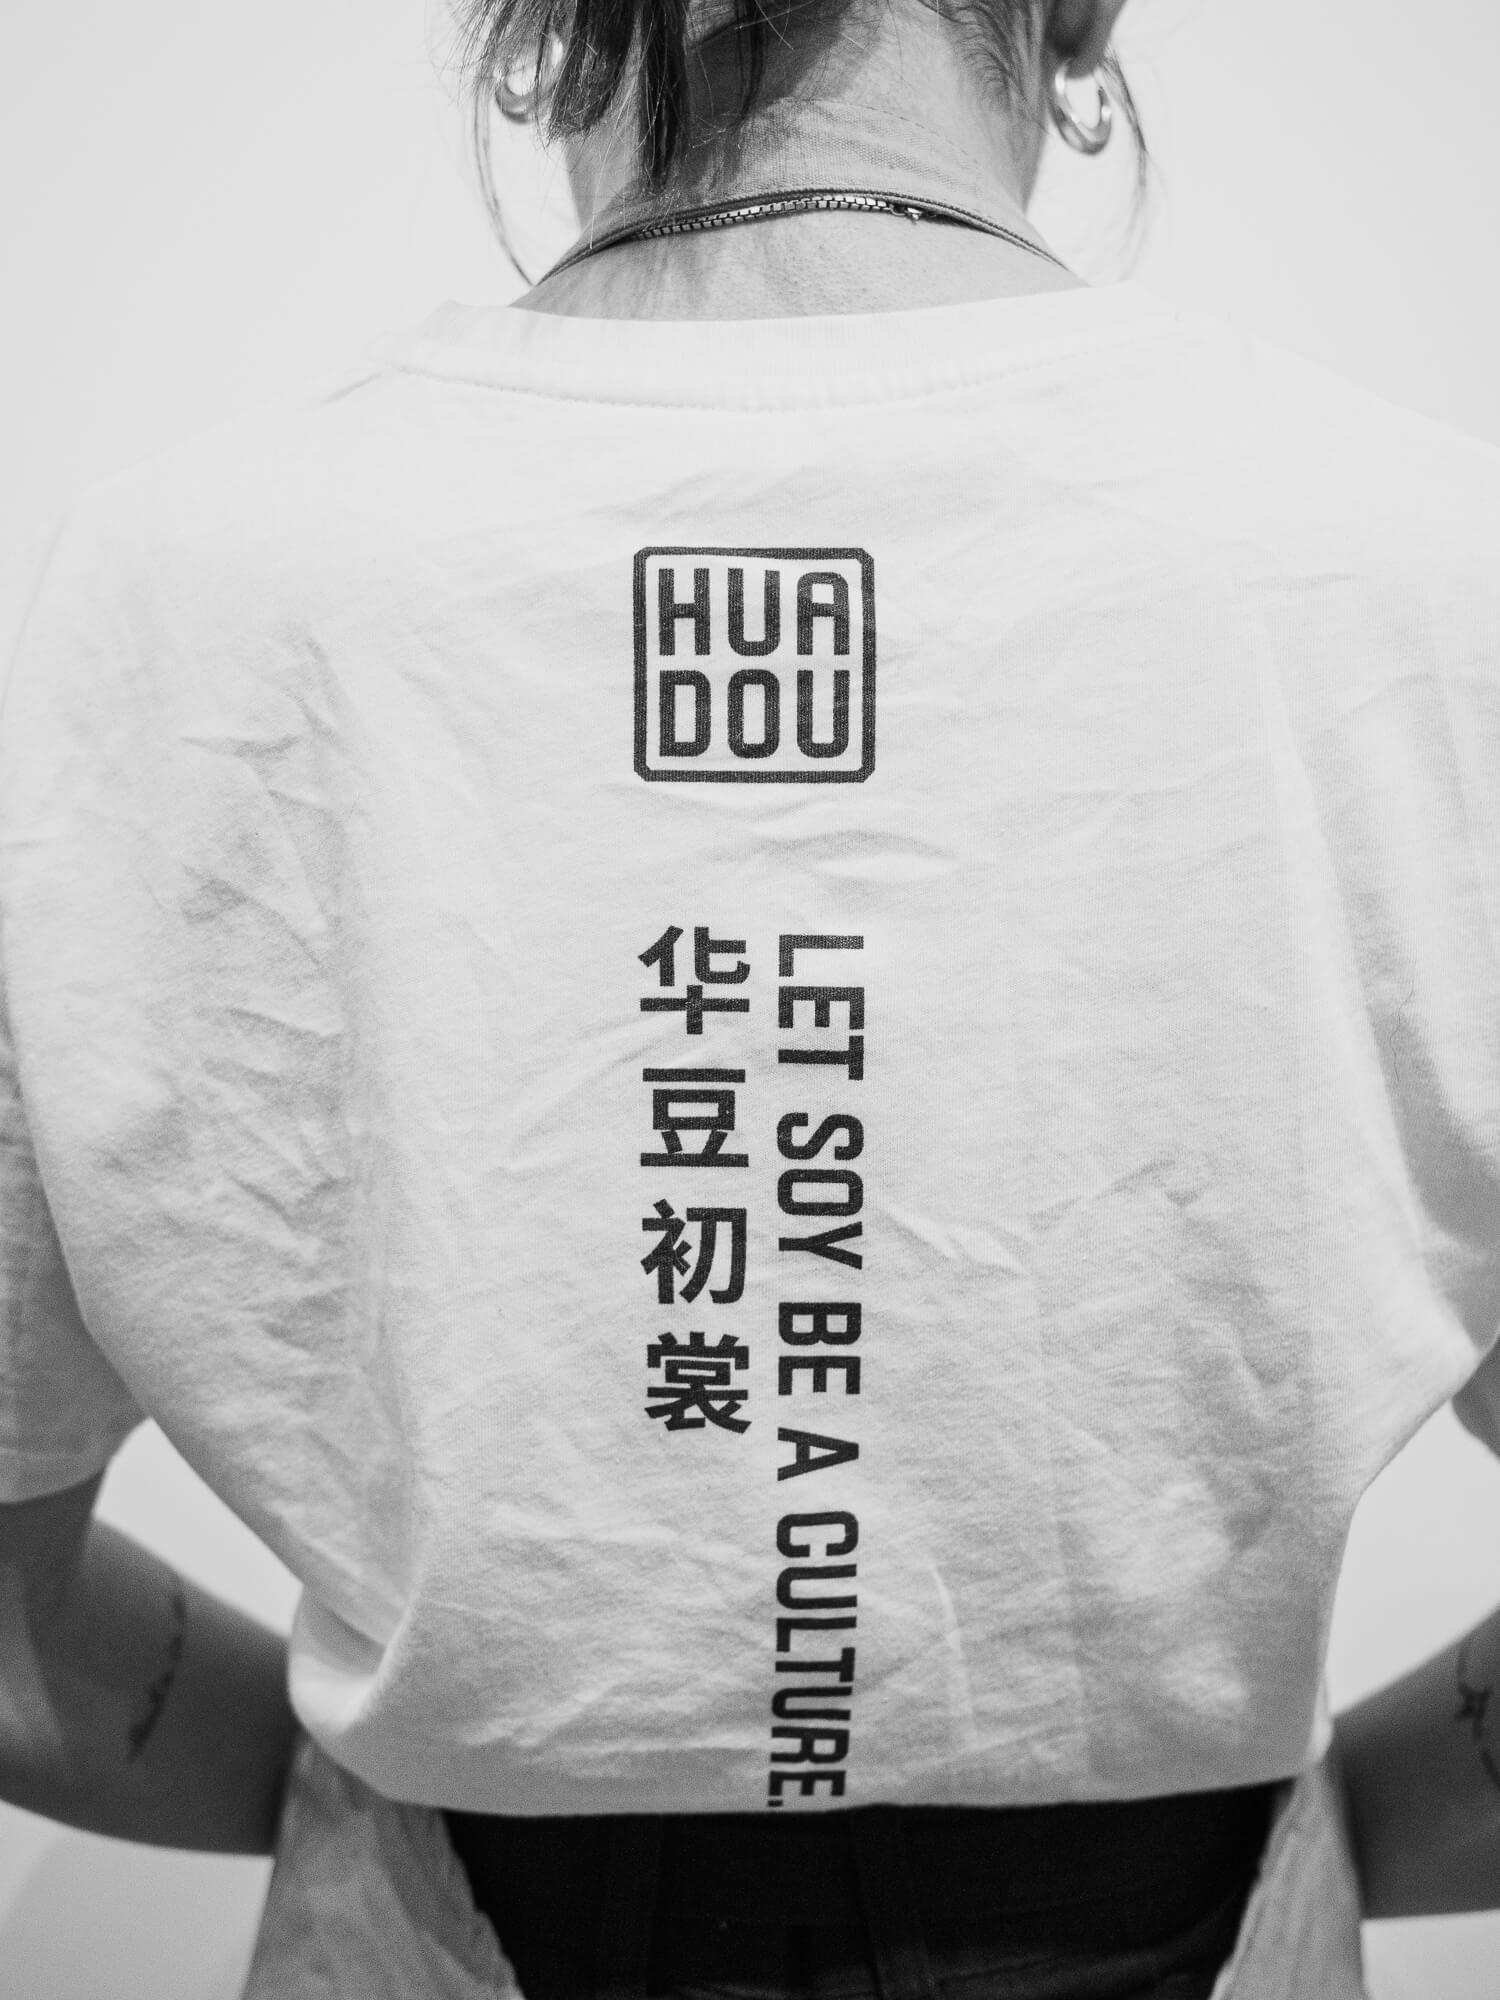 HUADOU-0011448